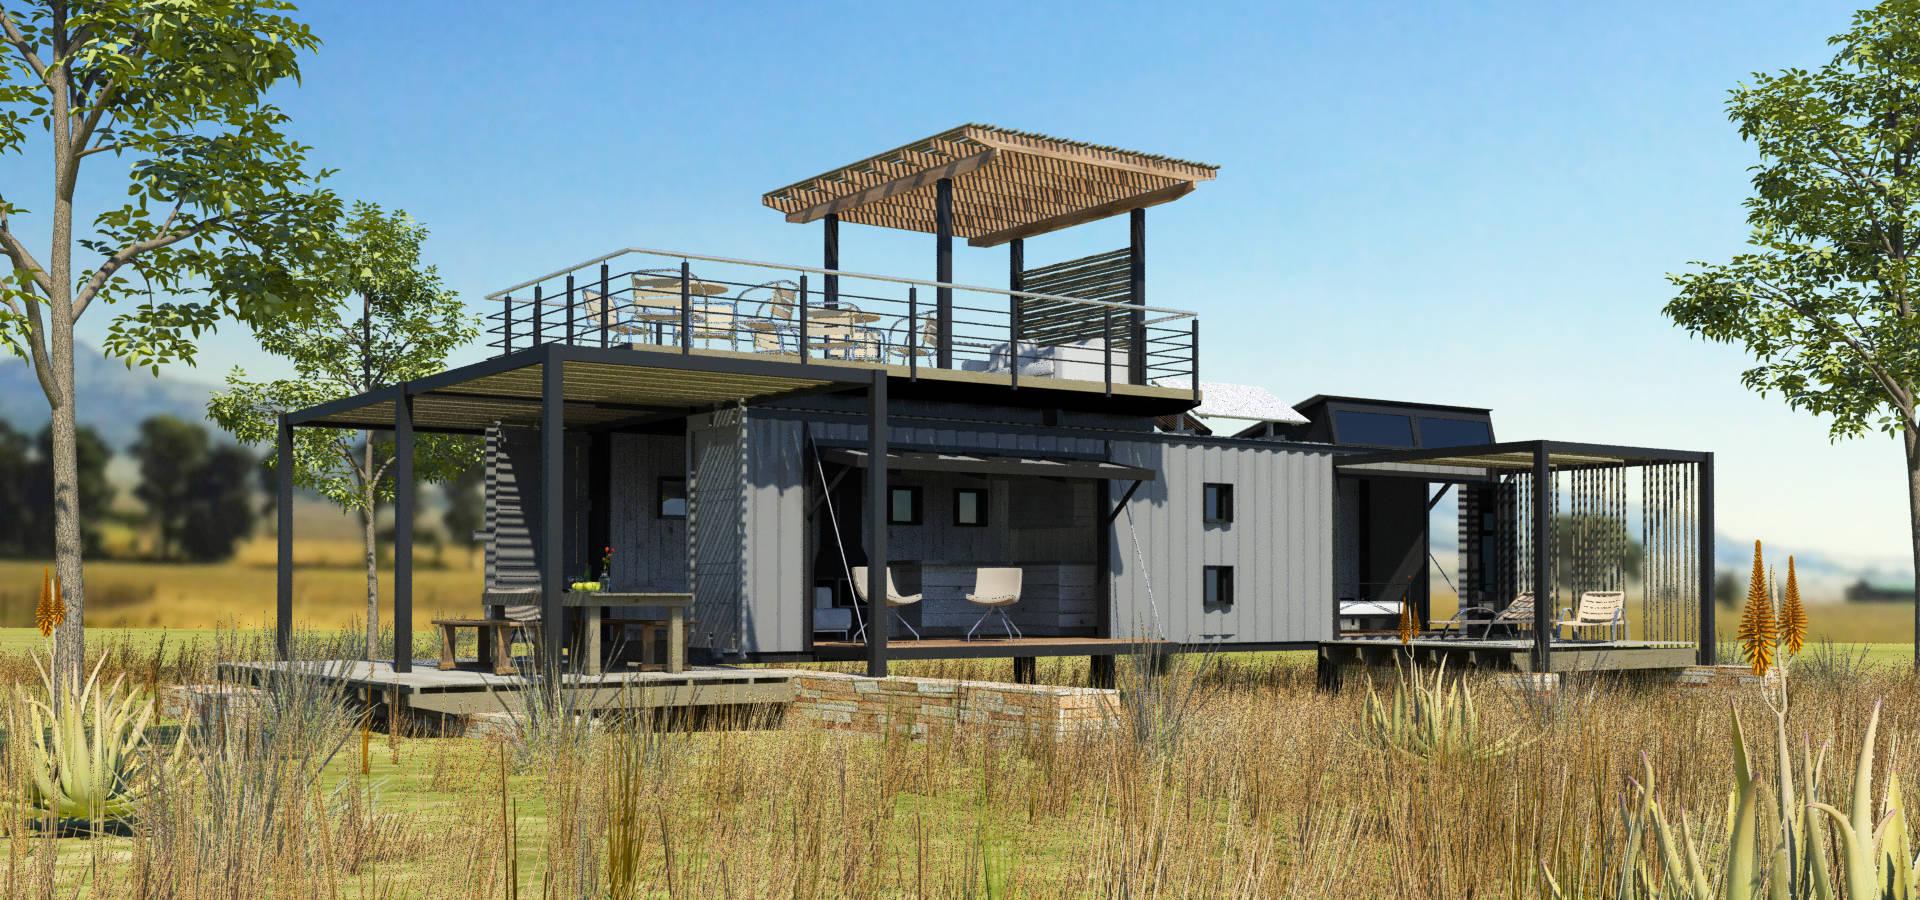 Edge design studio architects steel portal framed house for Tri steel home plans